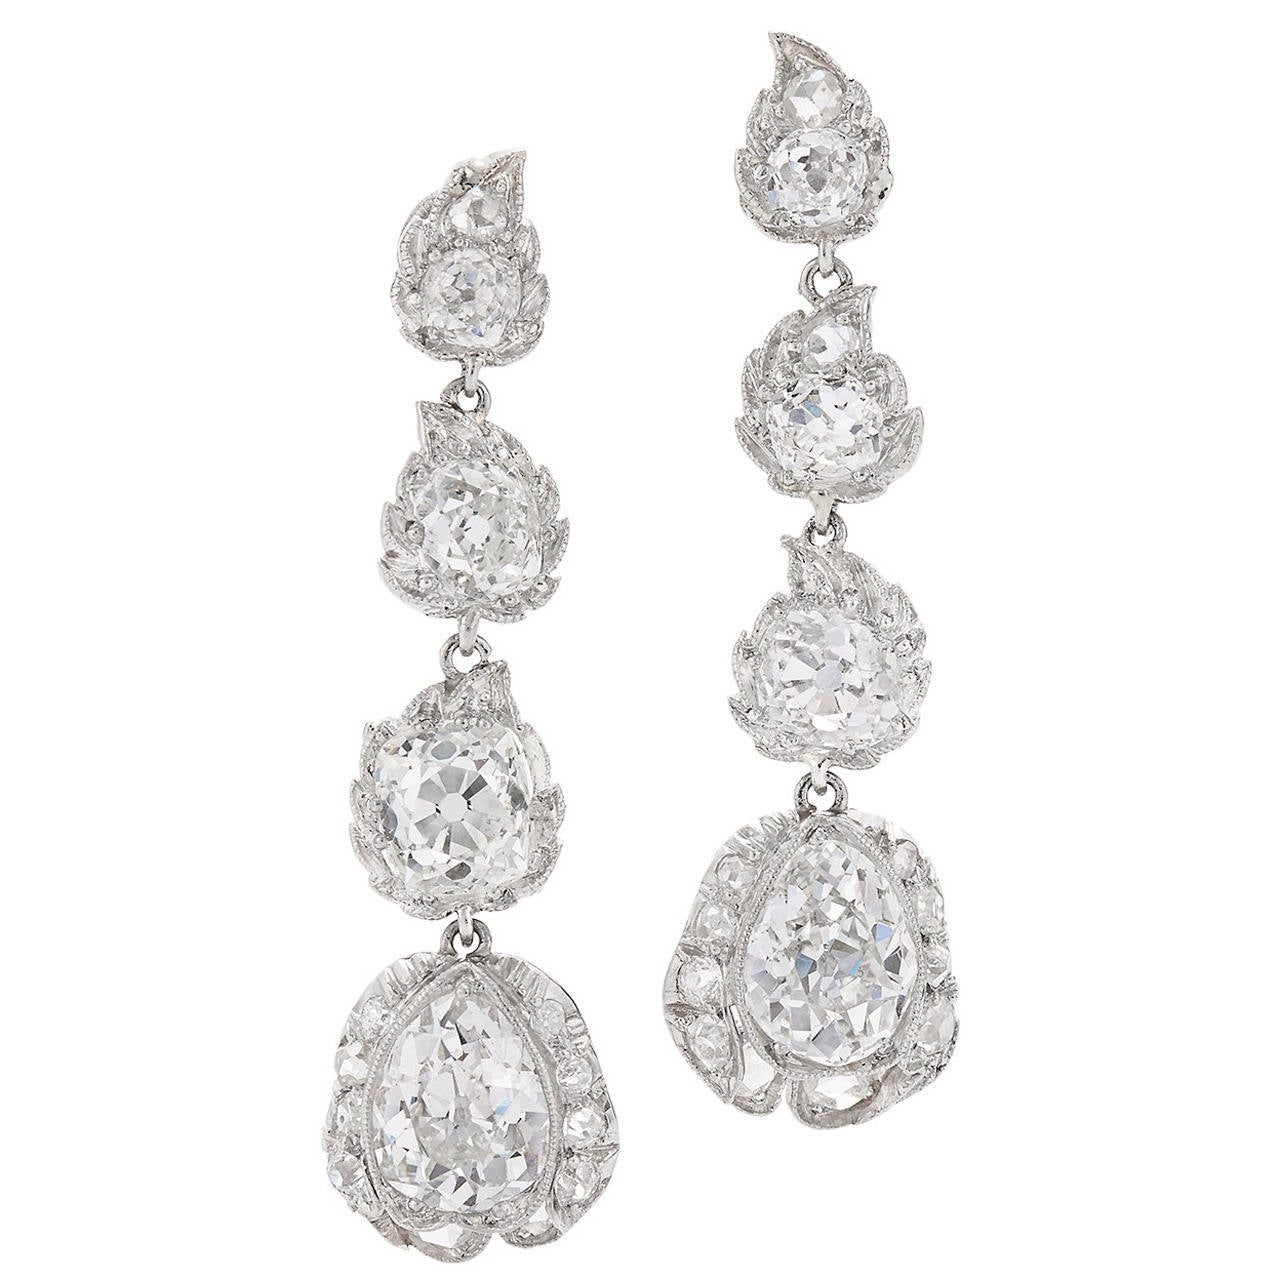 Edwardian Diamond Platinum Stylized Flower Bud Pendant Earrings For Sale